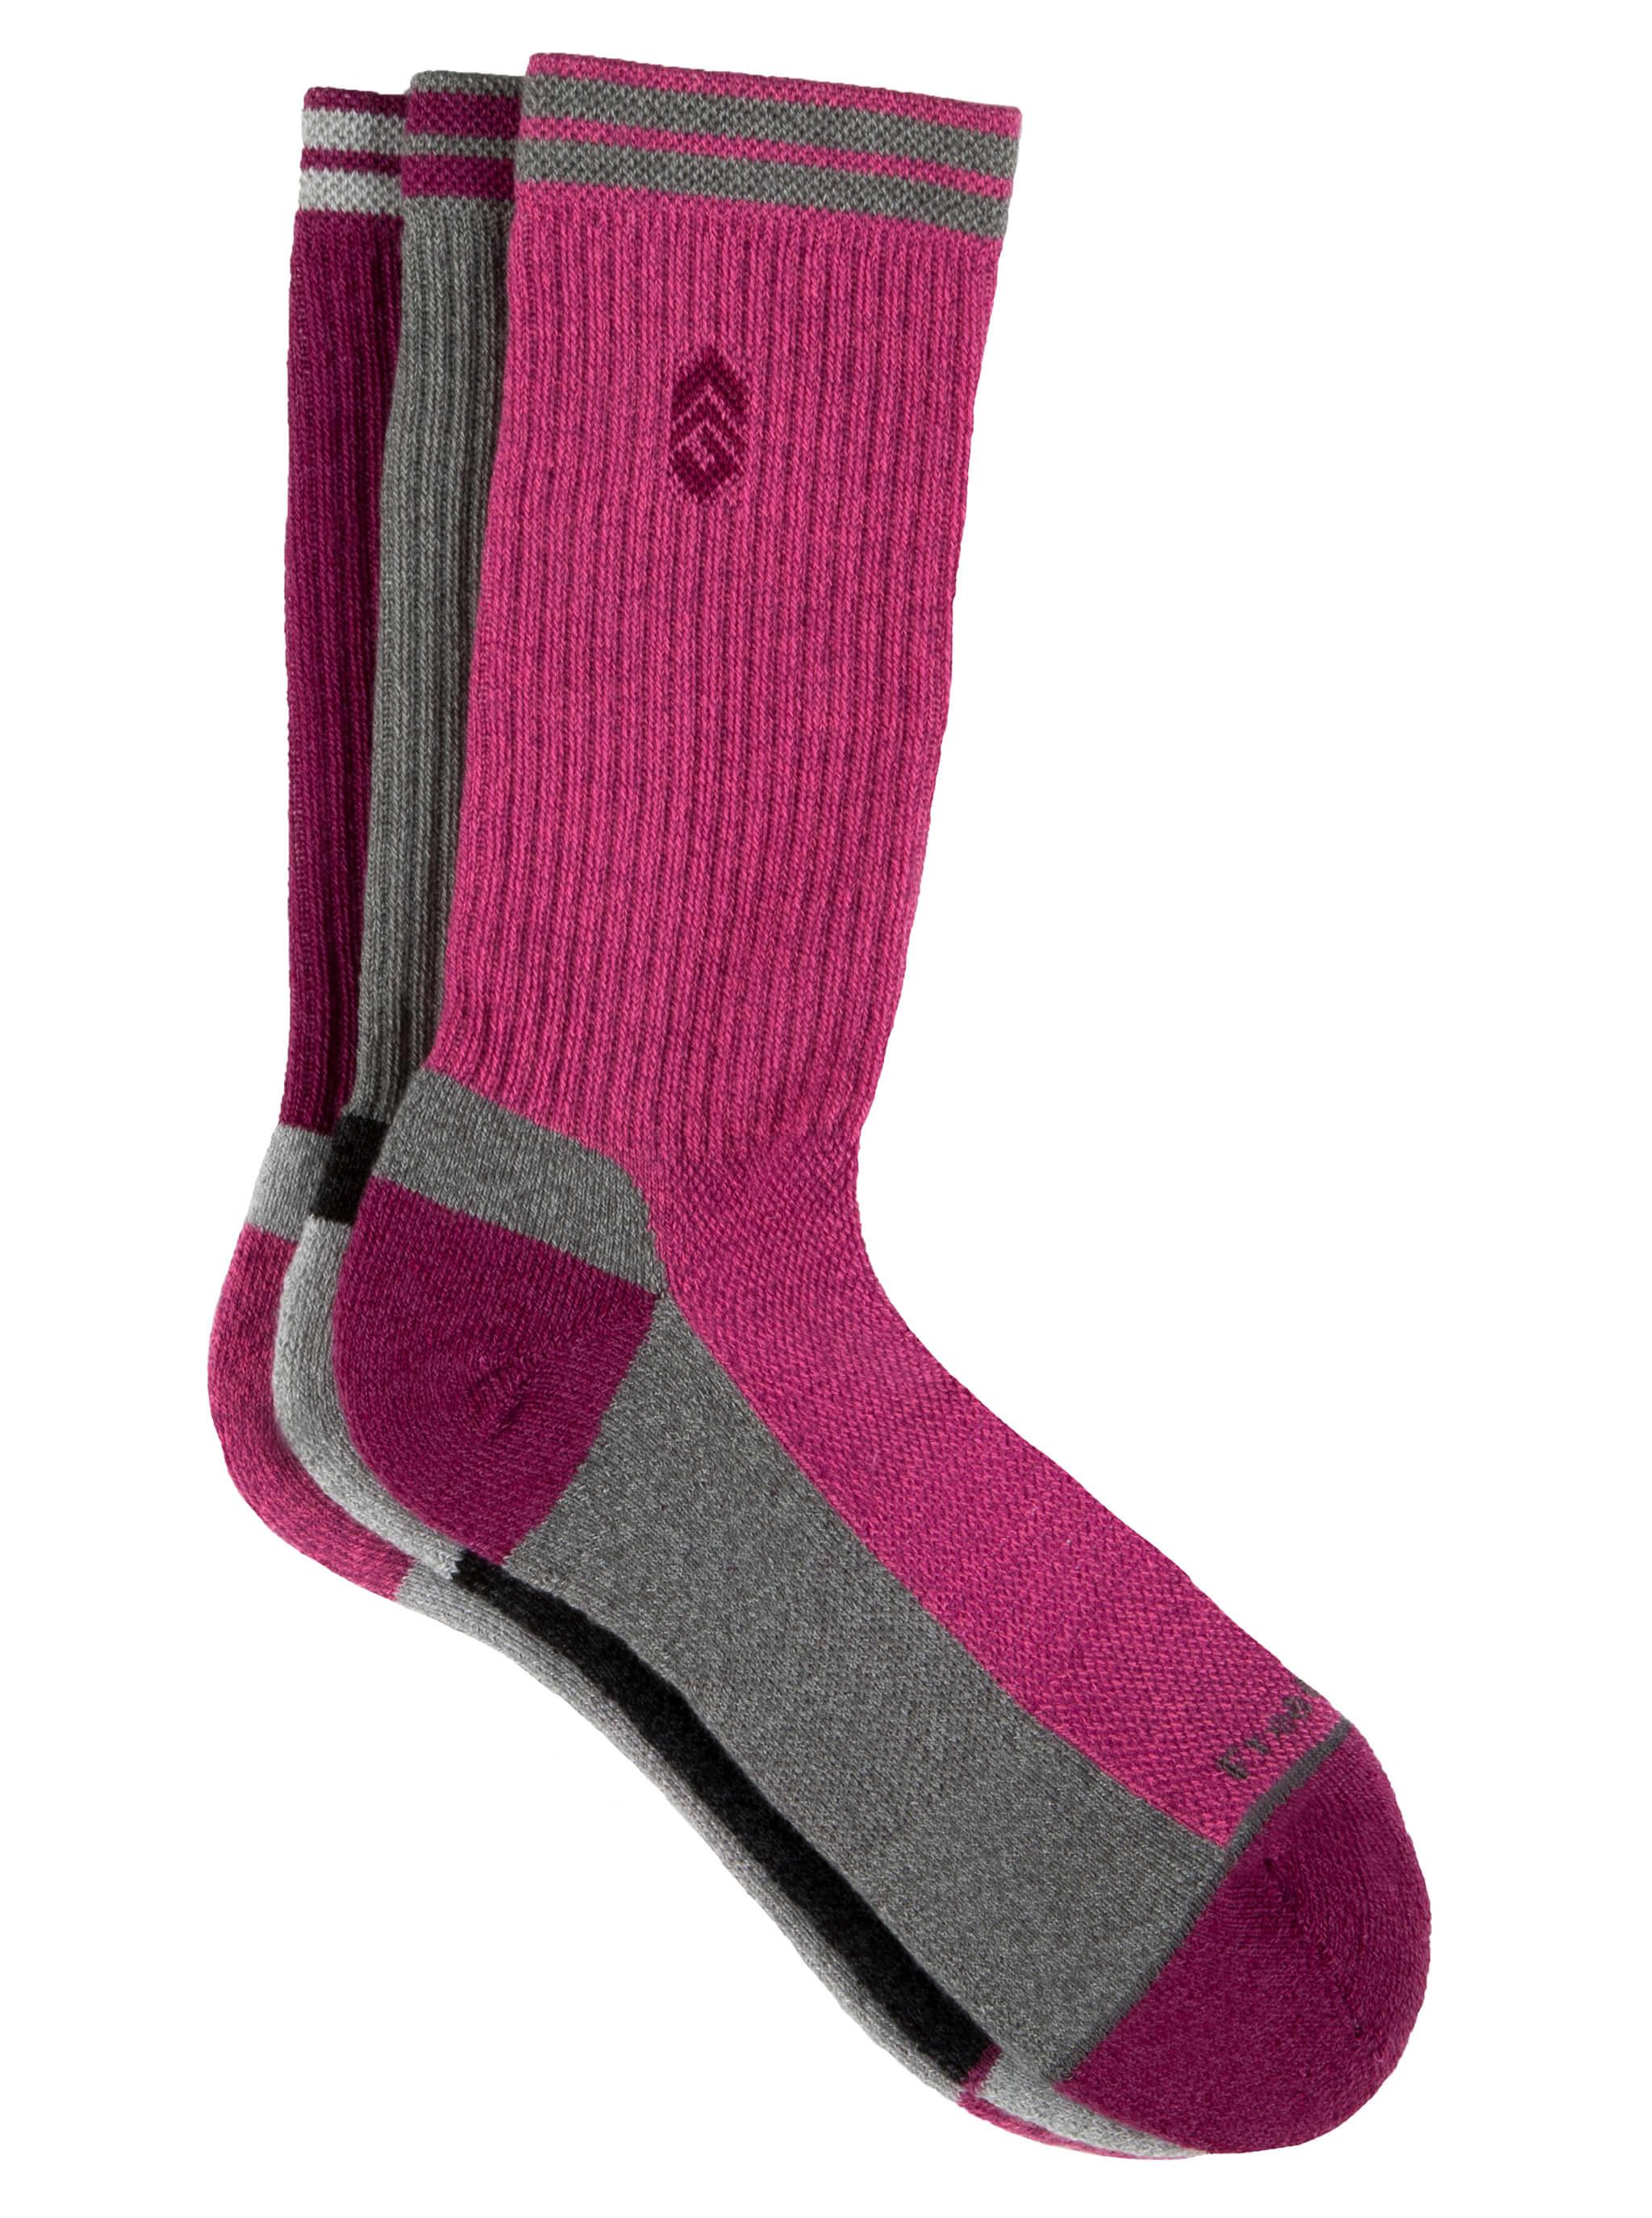 Free Country Women's Basic Varsity Stripe Crew Socks - Pink - 6-10